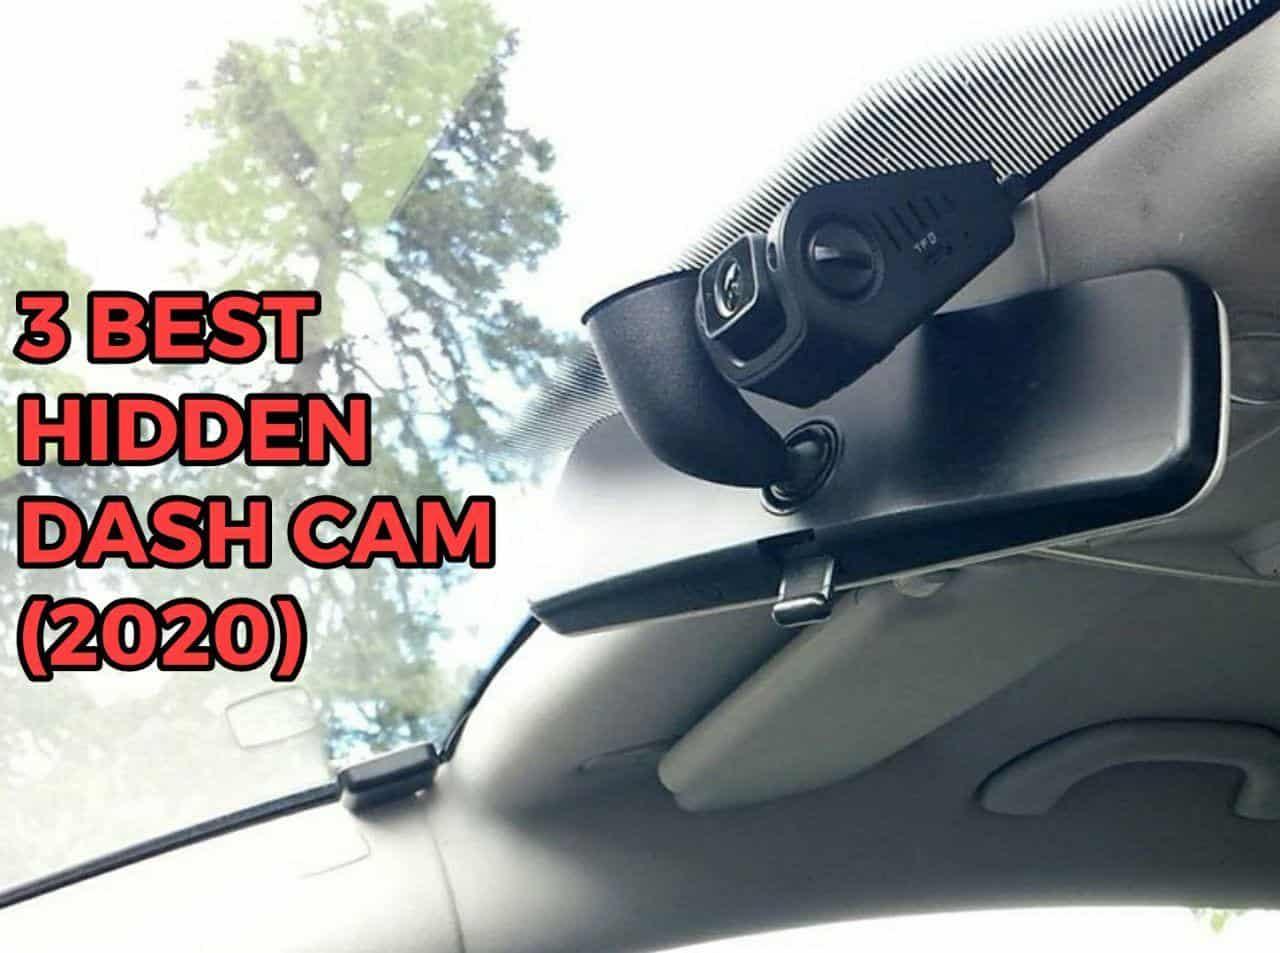 hidden dash cam